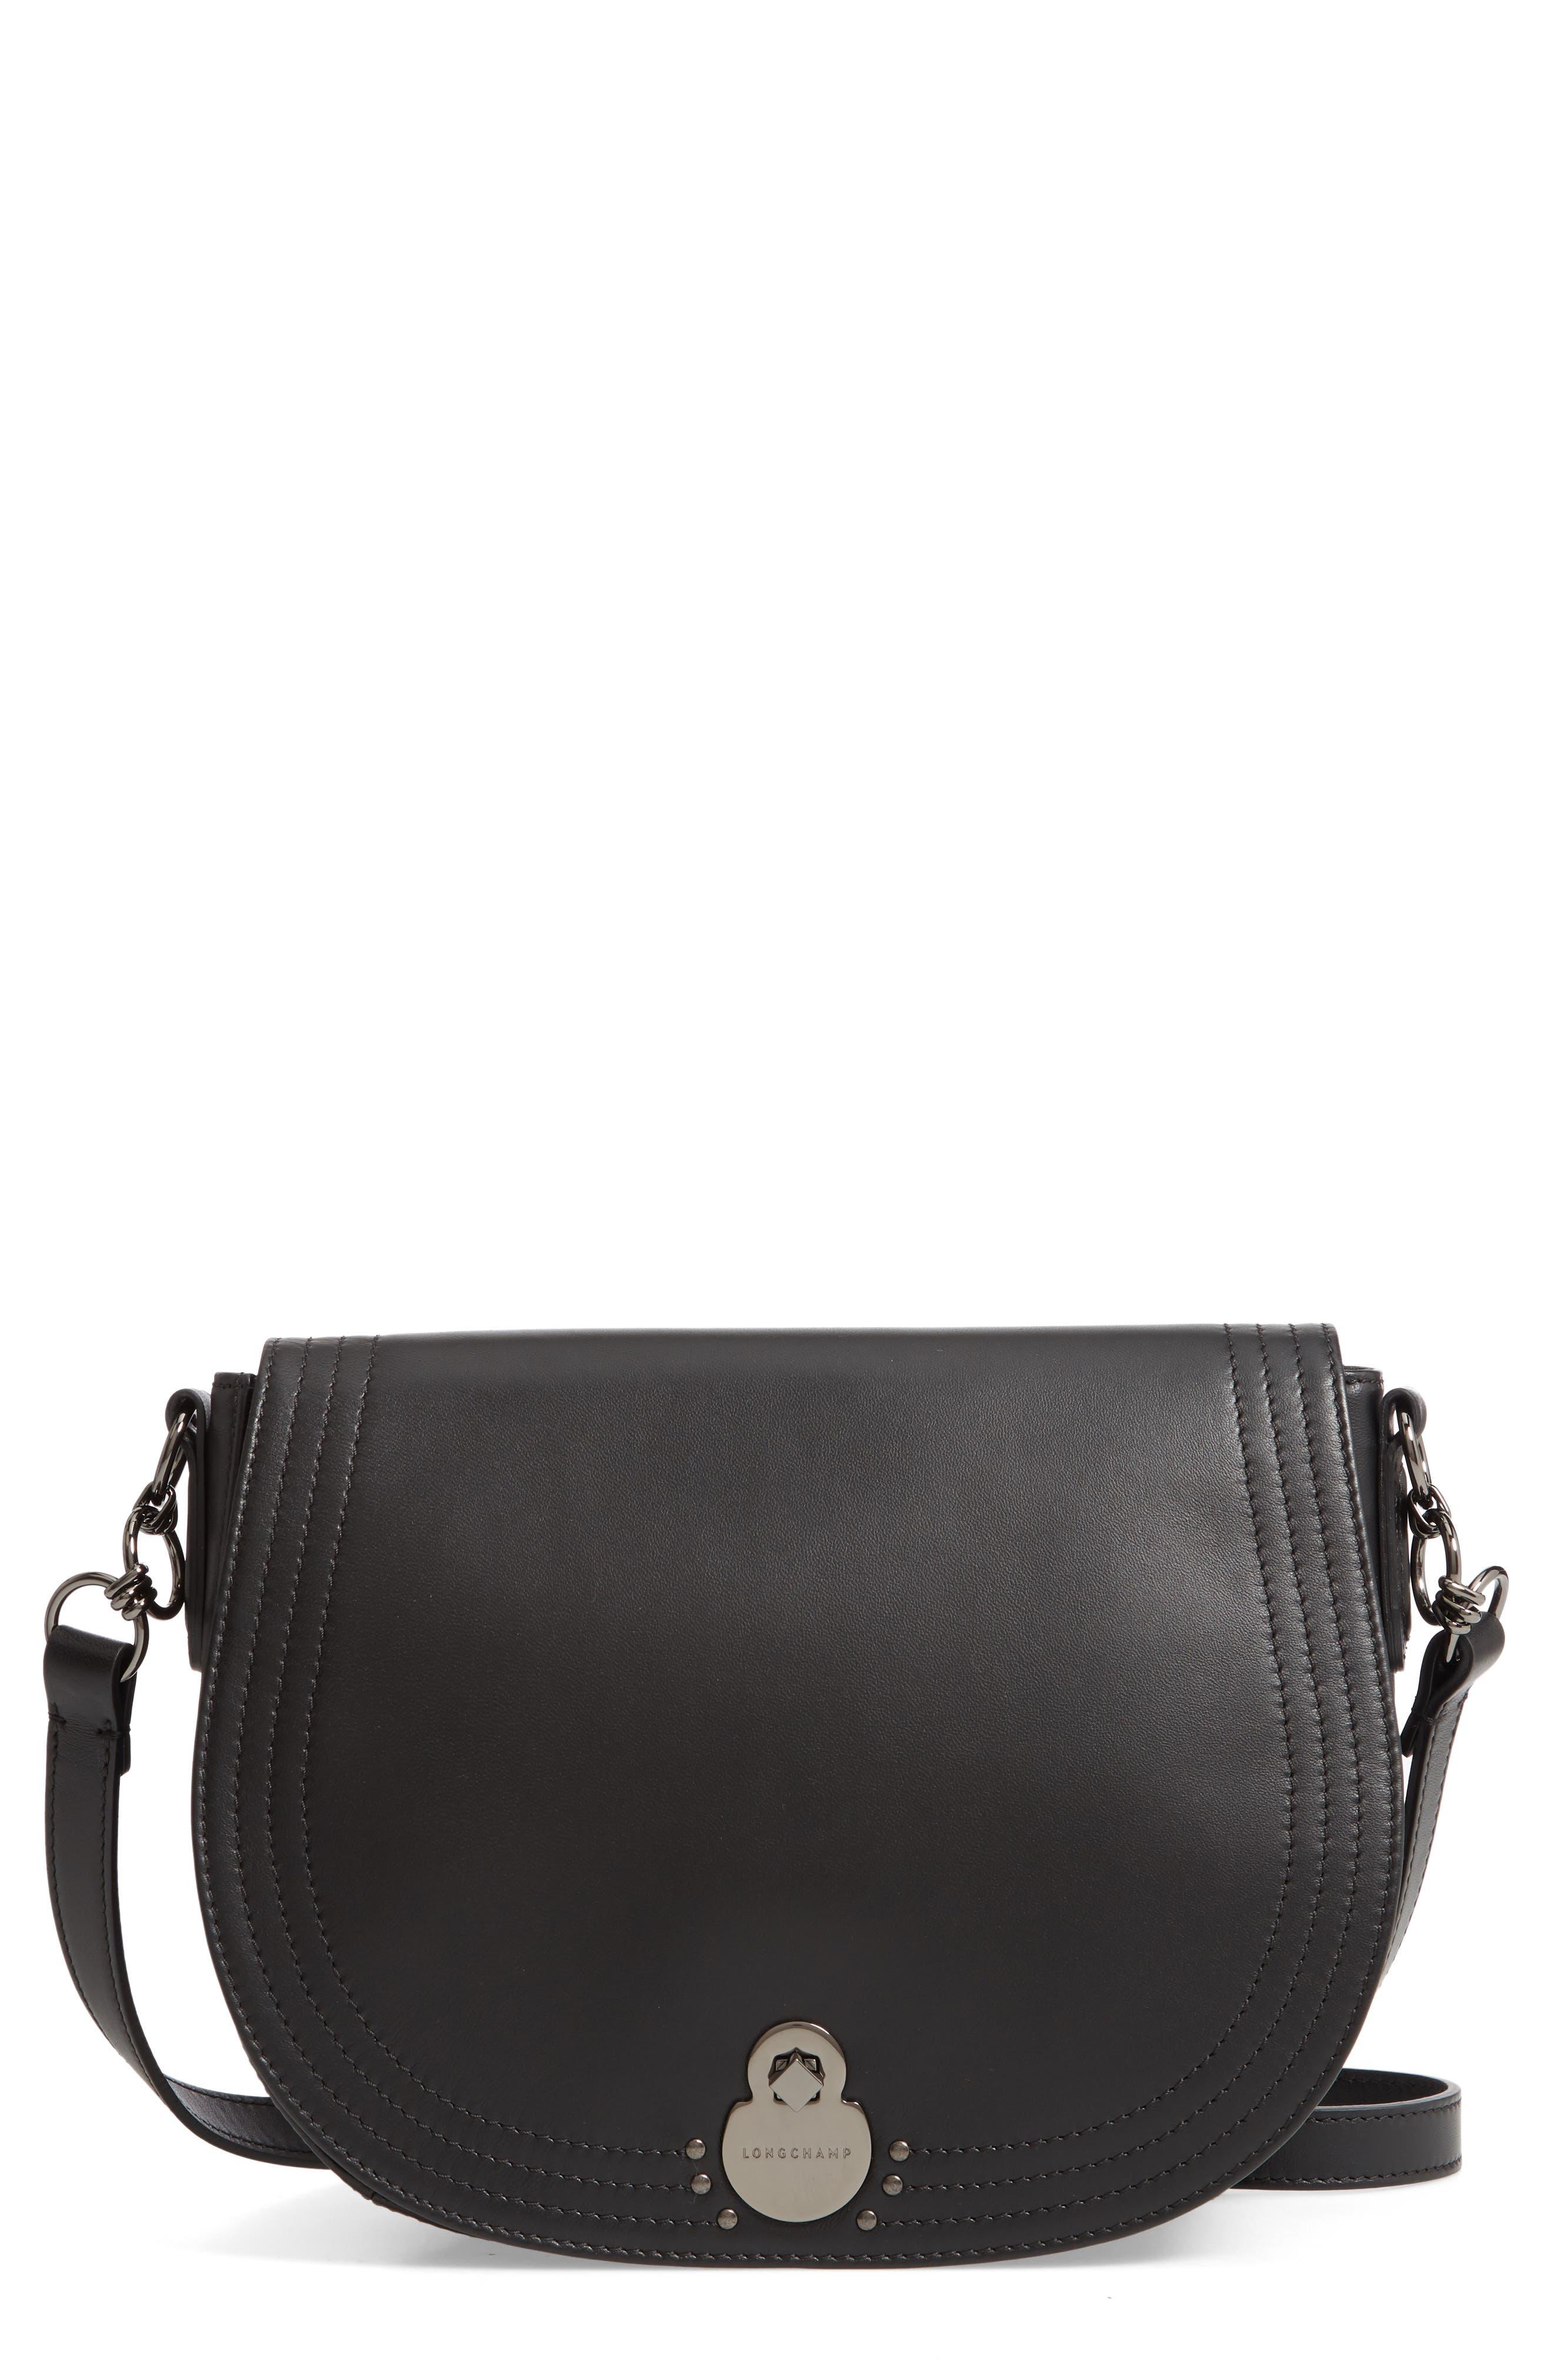 Medium Cavalcade Leather Saddle Bag,                             Main thumbnail 1, color,                             BLACK